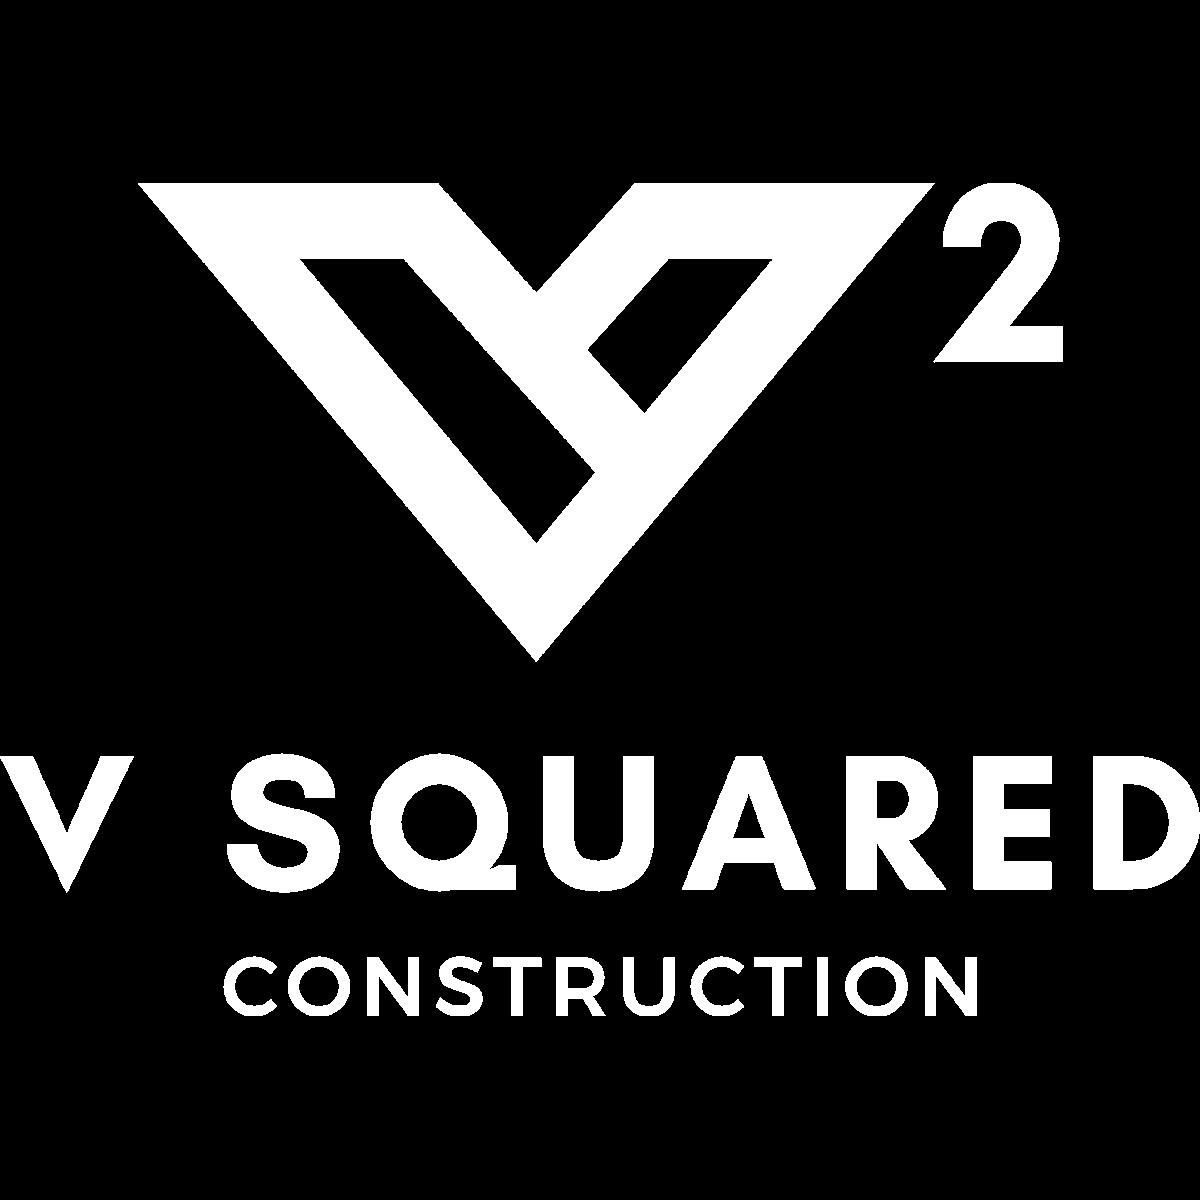 V Squared Construction